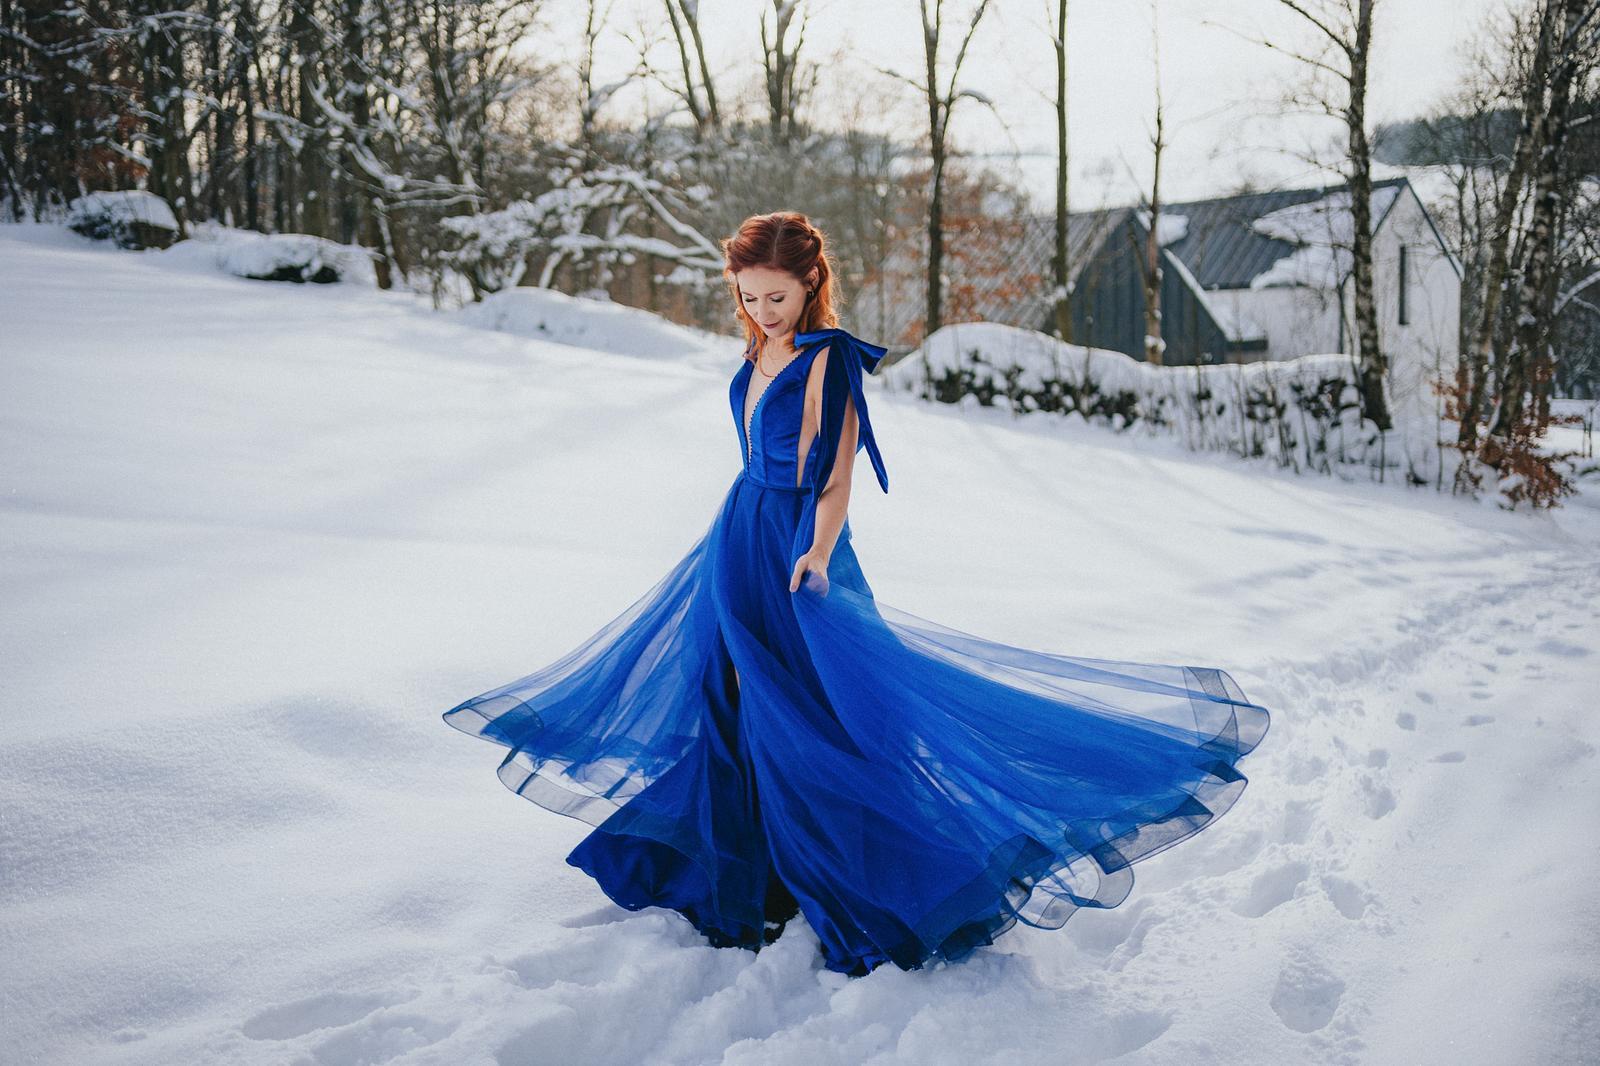 Zimní svatba M&M - Obrázek č. 11